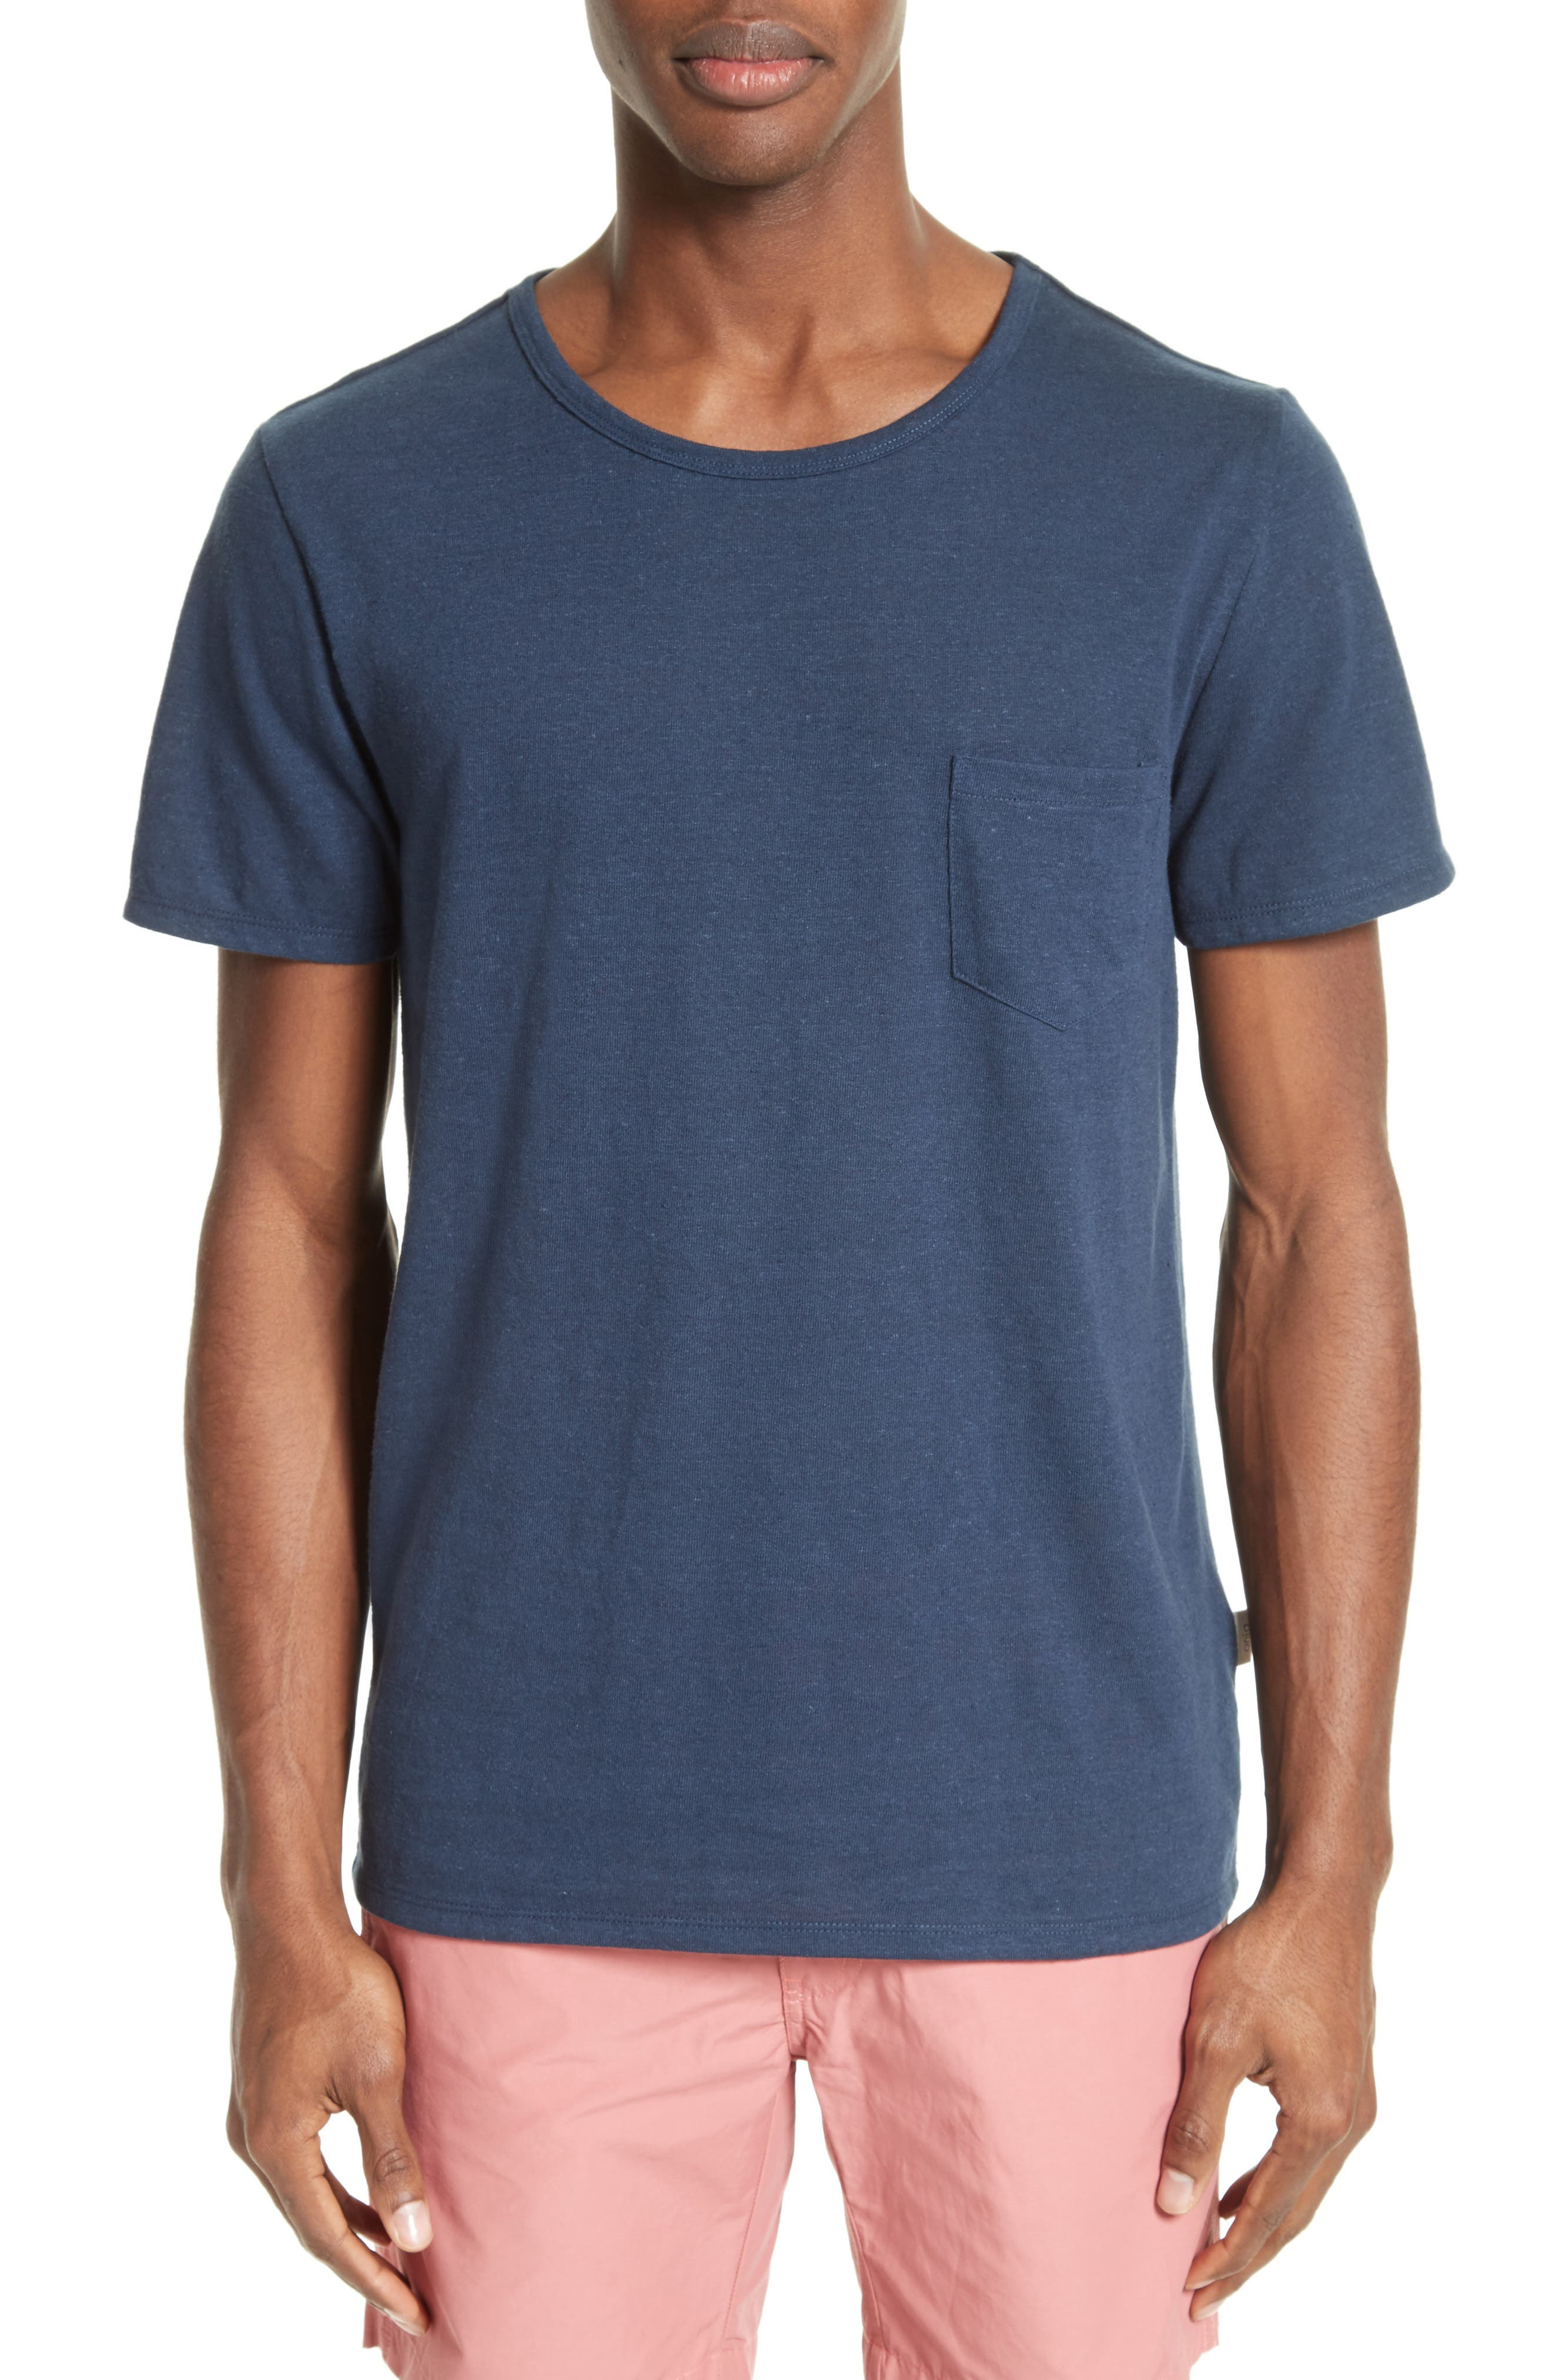 Alternate Image 1 Selected - ONIA Chad Linen Blend Pocket T-Shirt